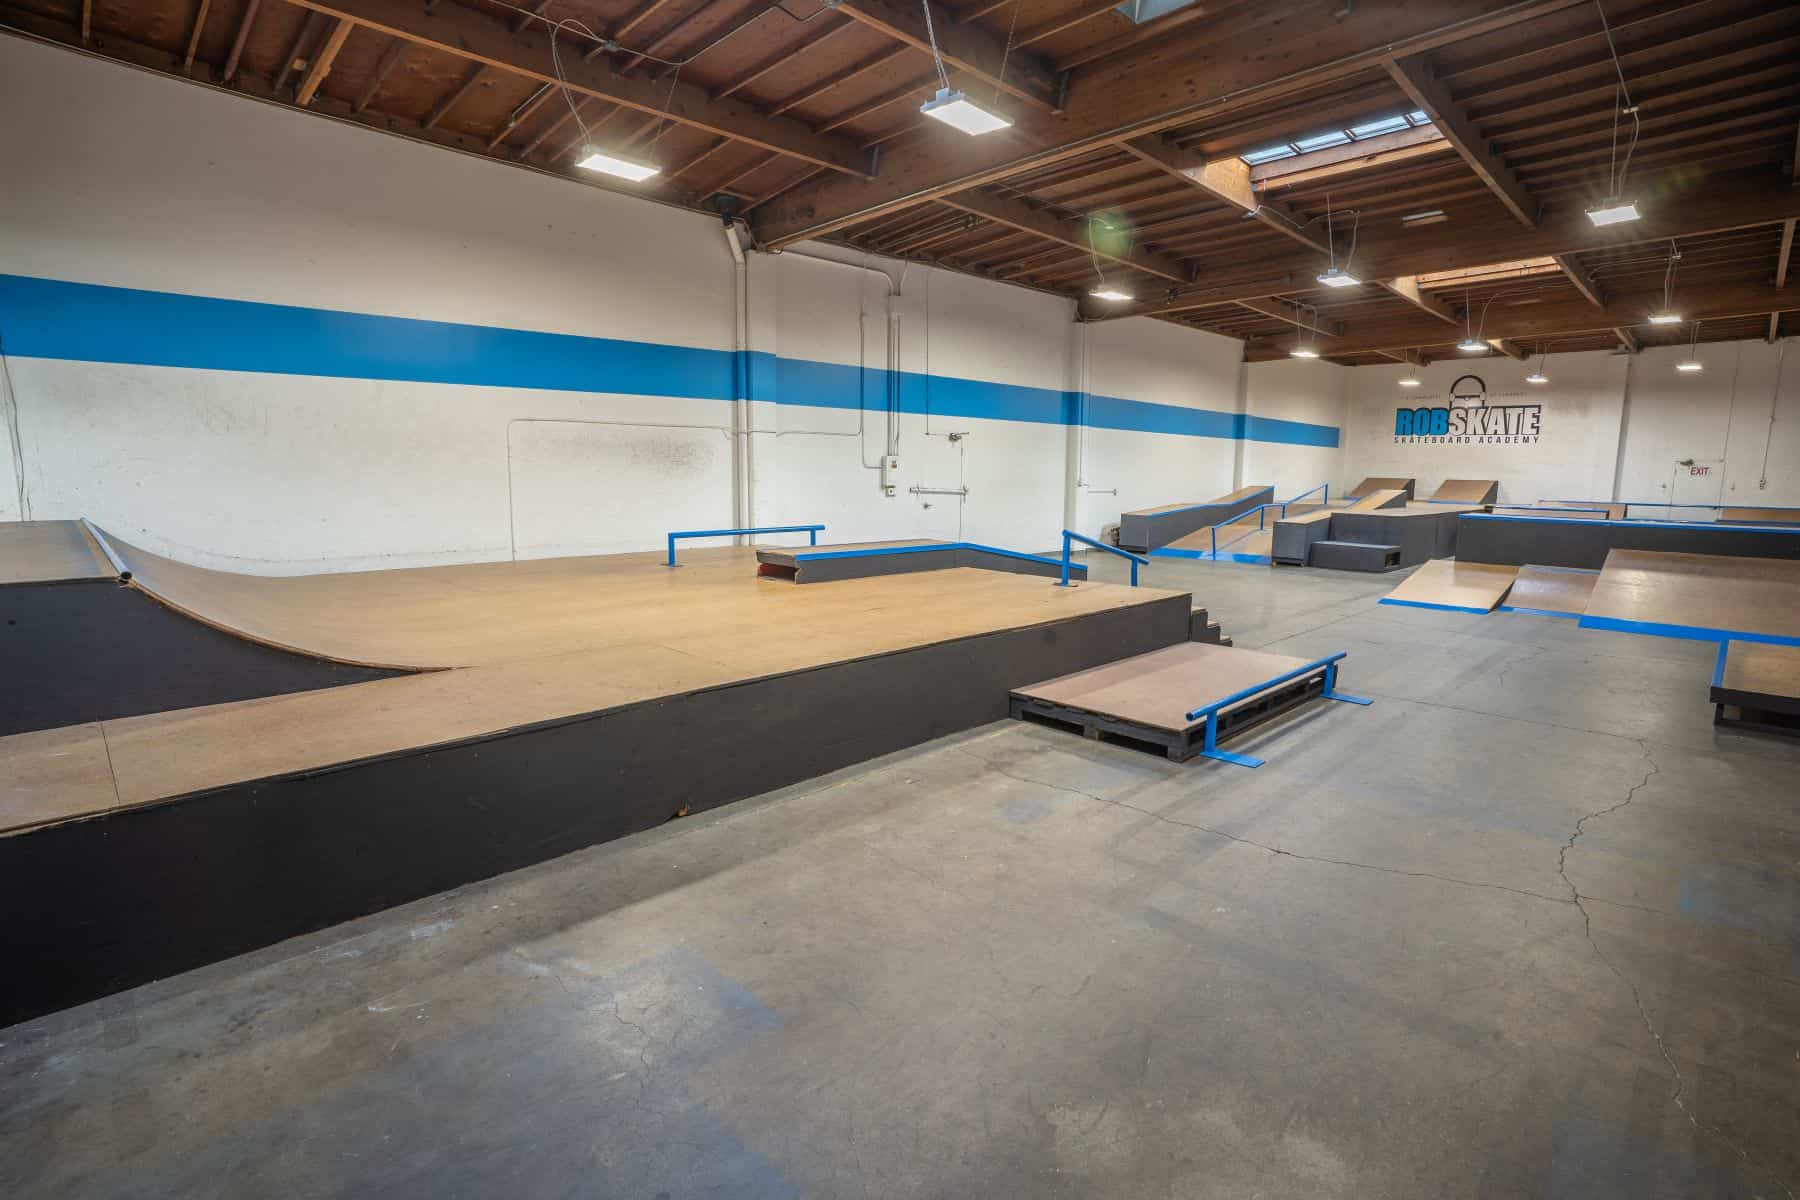 Rob Skate - San Leandro Private Skatepark 23